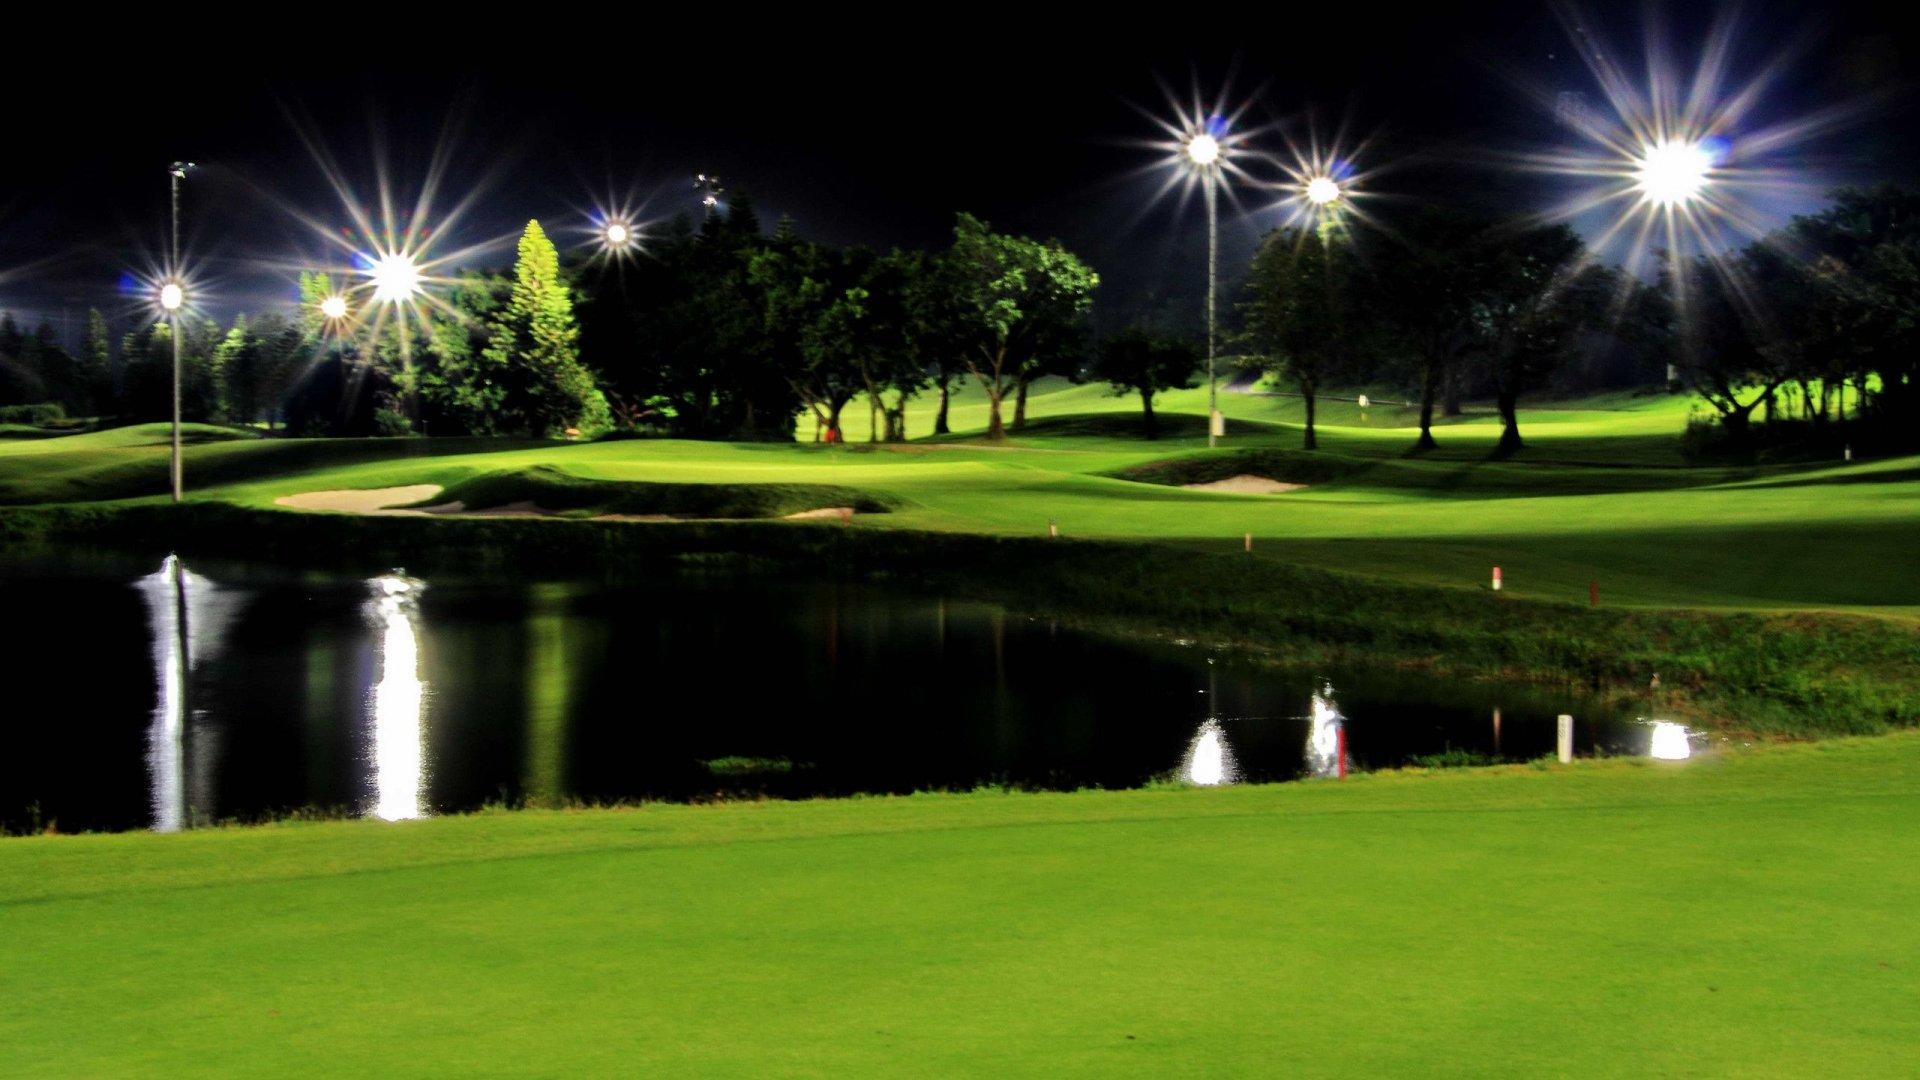 Free Golf Wallpaper, Golf Photos for Desktop | 39 Handpicked Golf ...